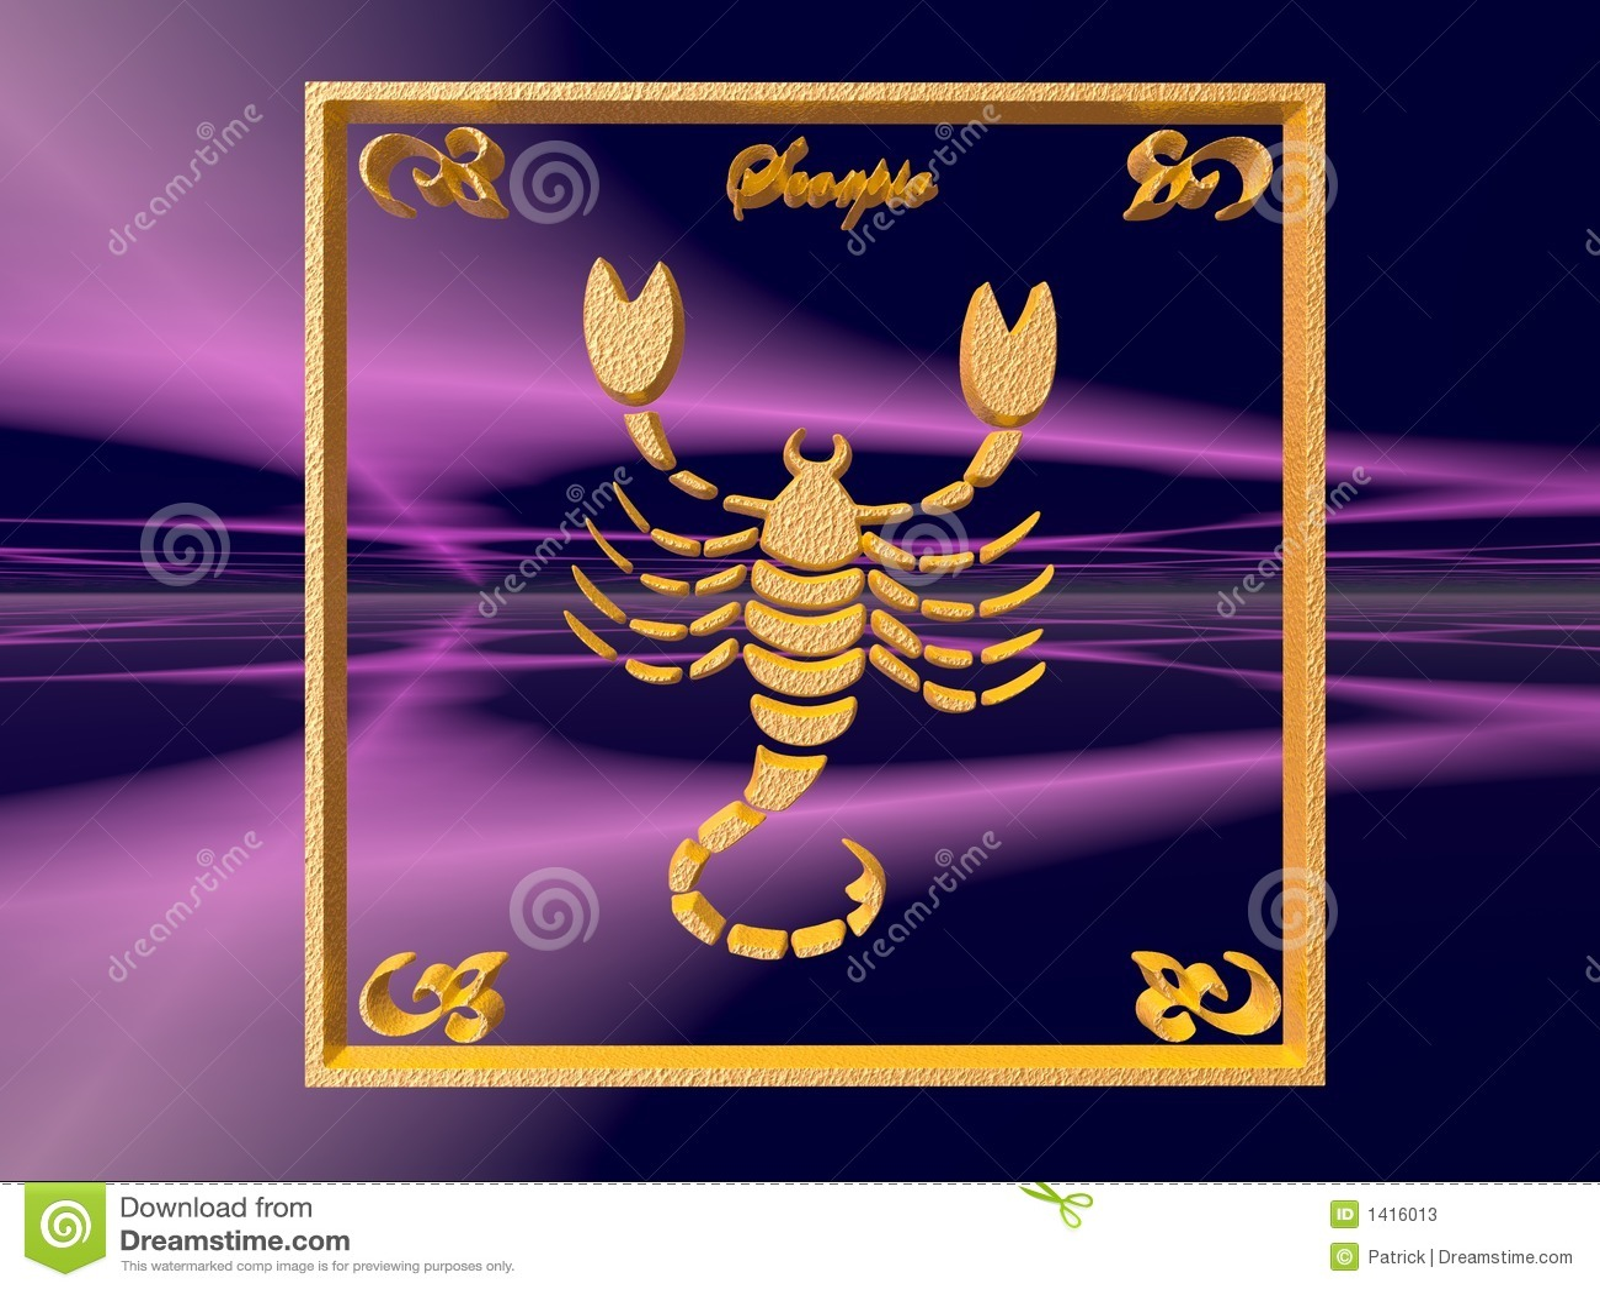 Zodiac horoscope brass logo scorpio, 3D illustration, background, wallpaper, clipping path copy space